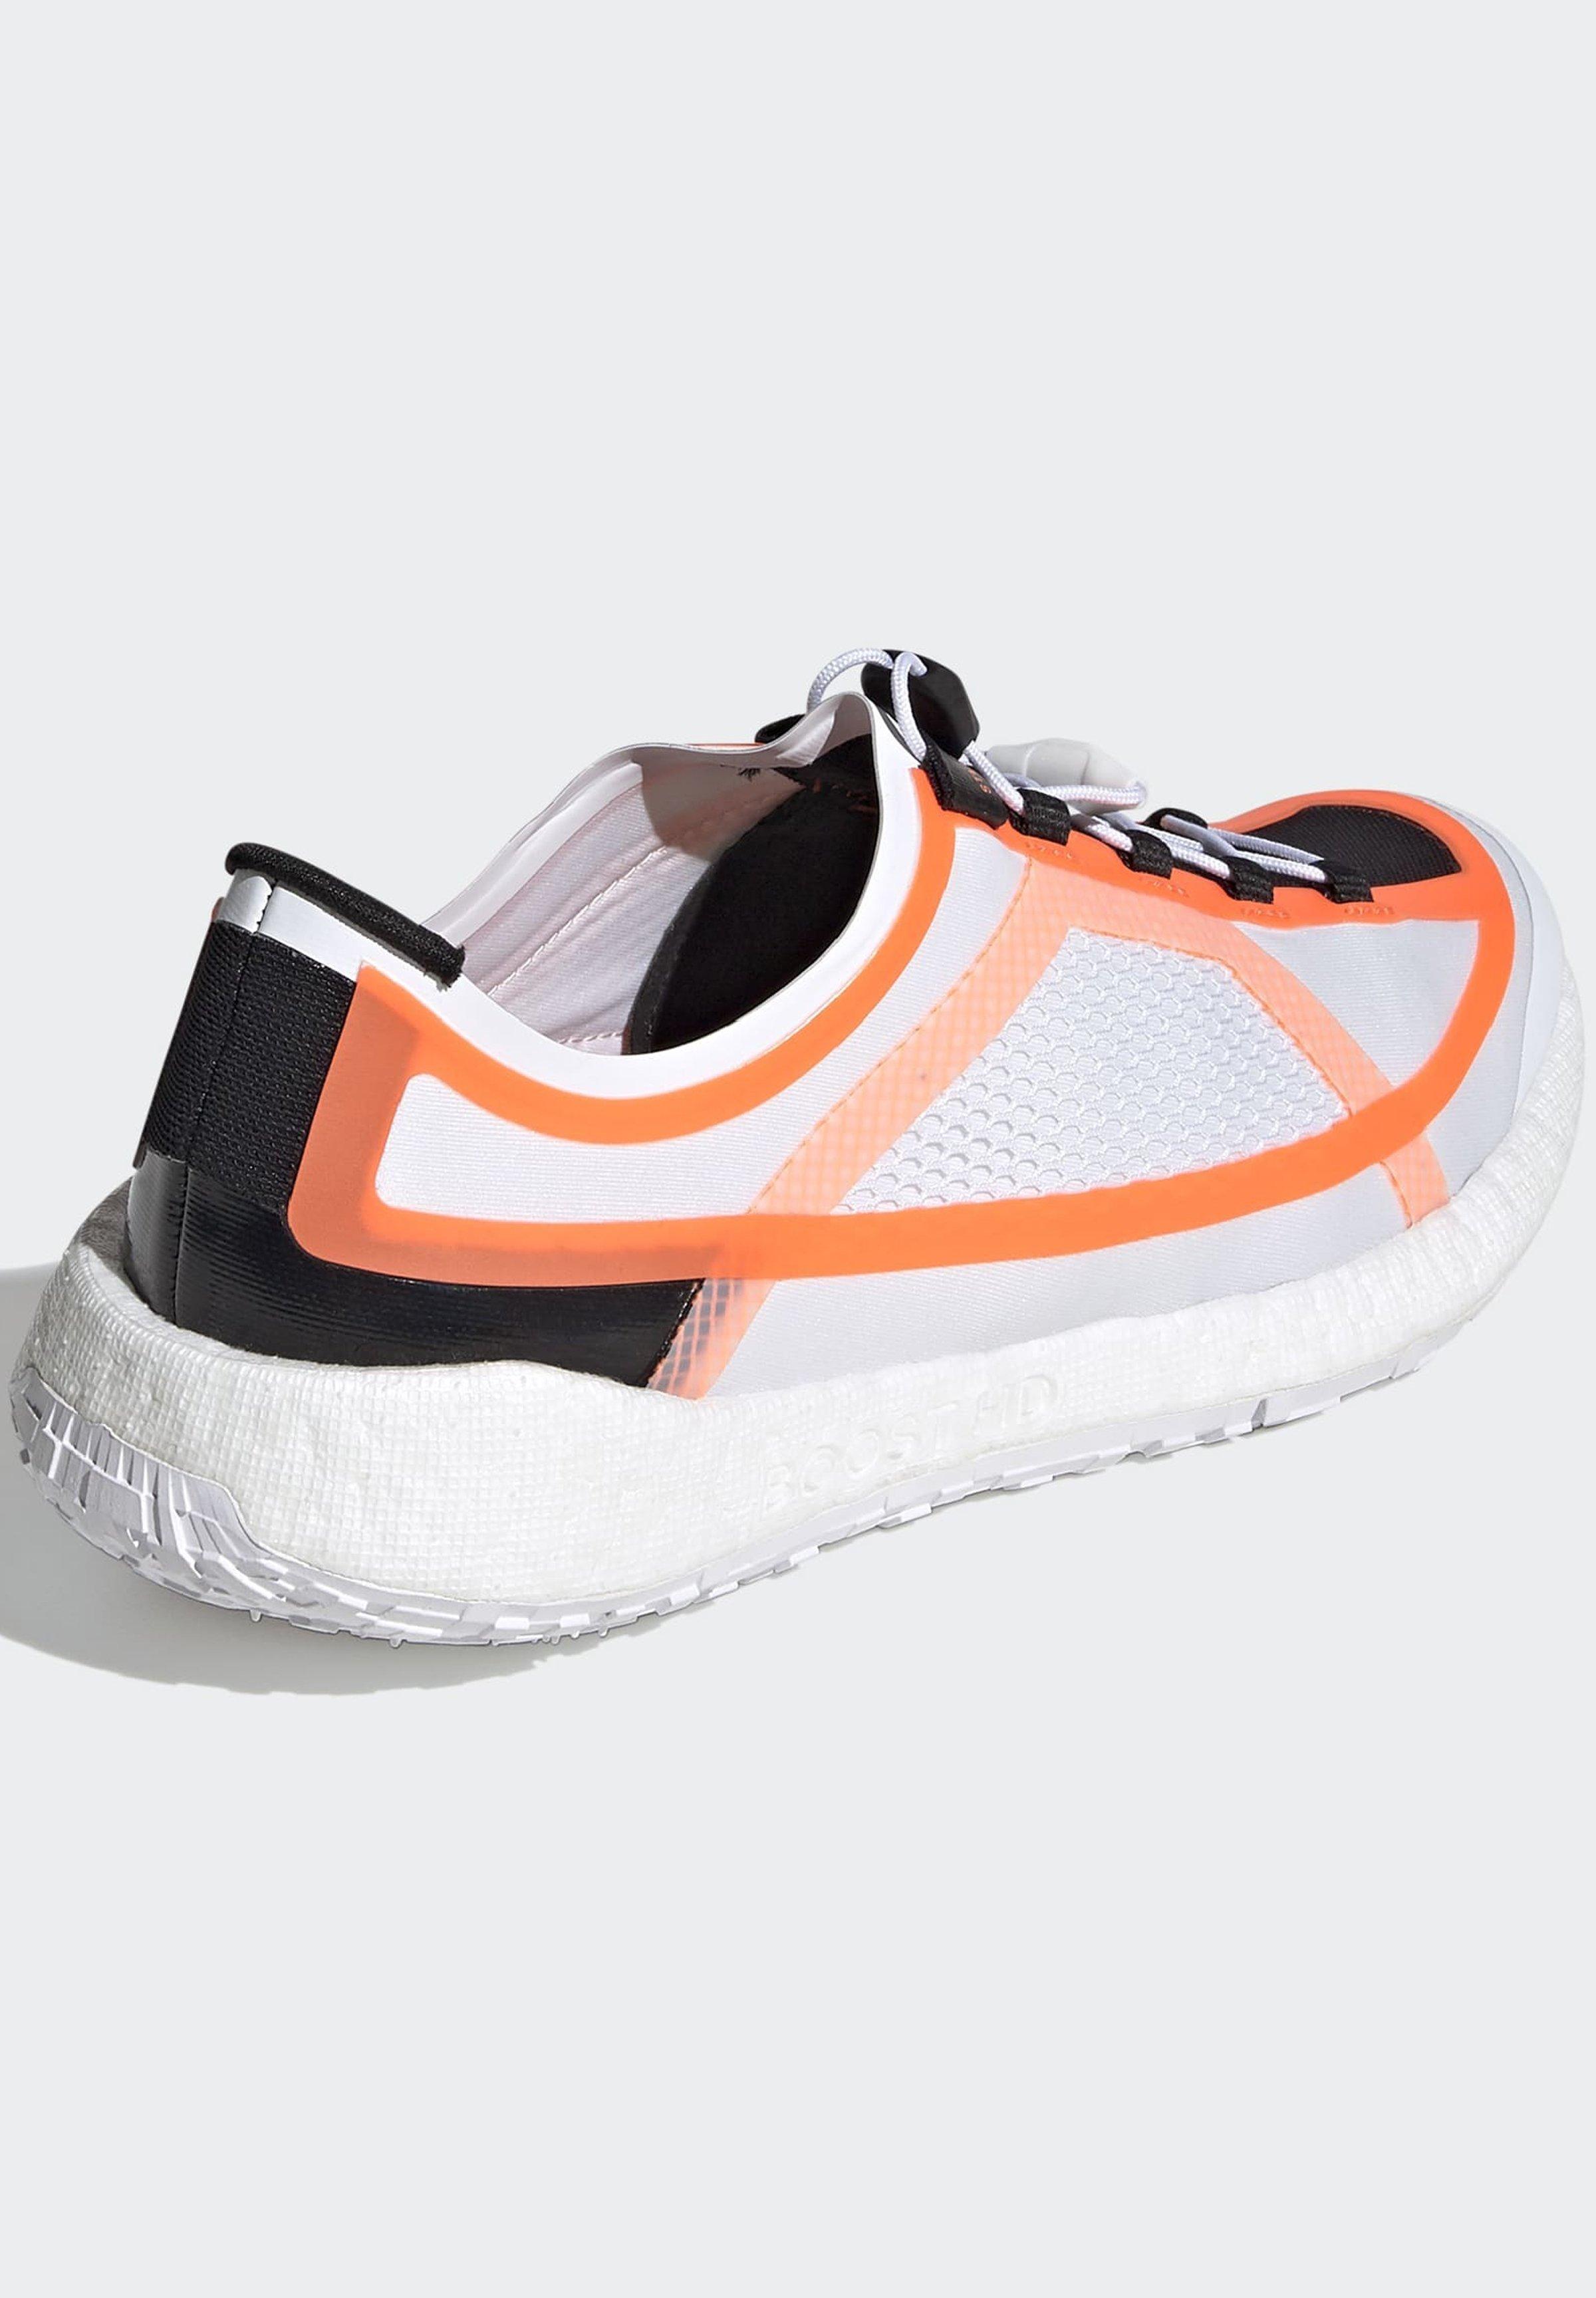 Adidas By Stella Mccartney 2020-03-02 Pulseboost Hd Shoes - Løbesko Trail White